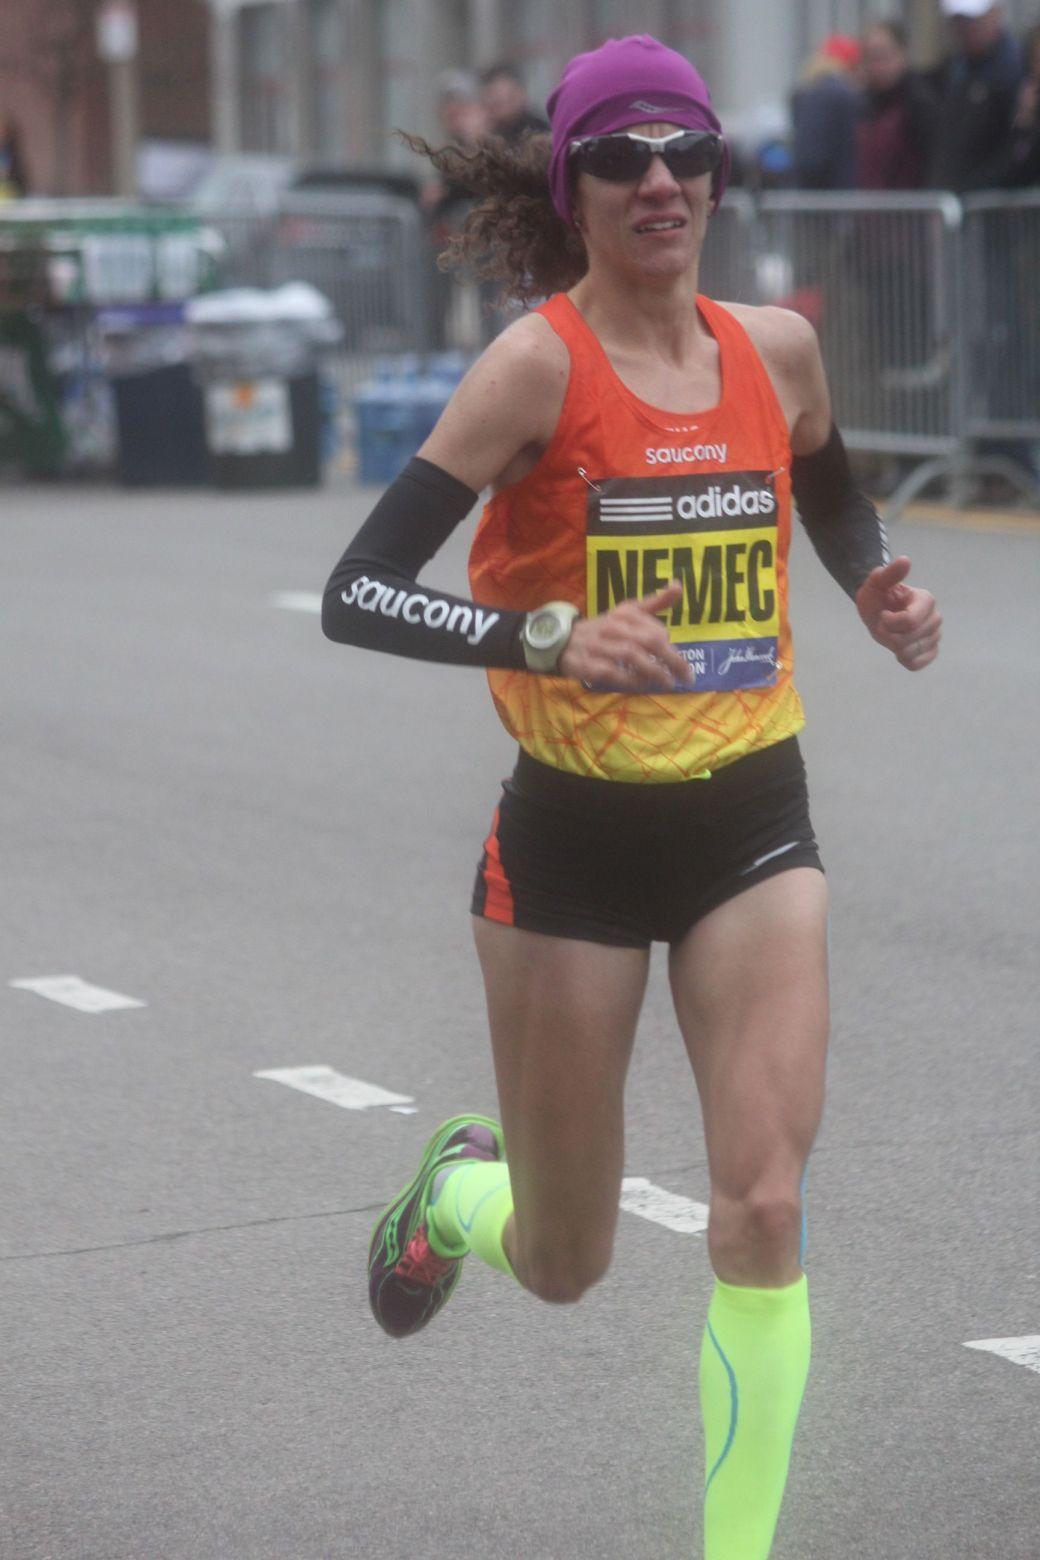 boston marathon april 20 2015 womens elite race lisa nemec 2